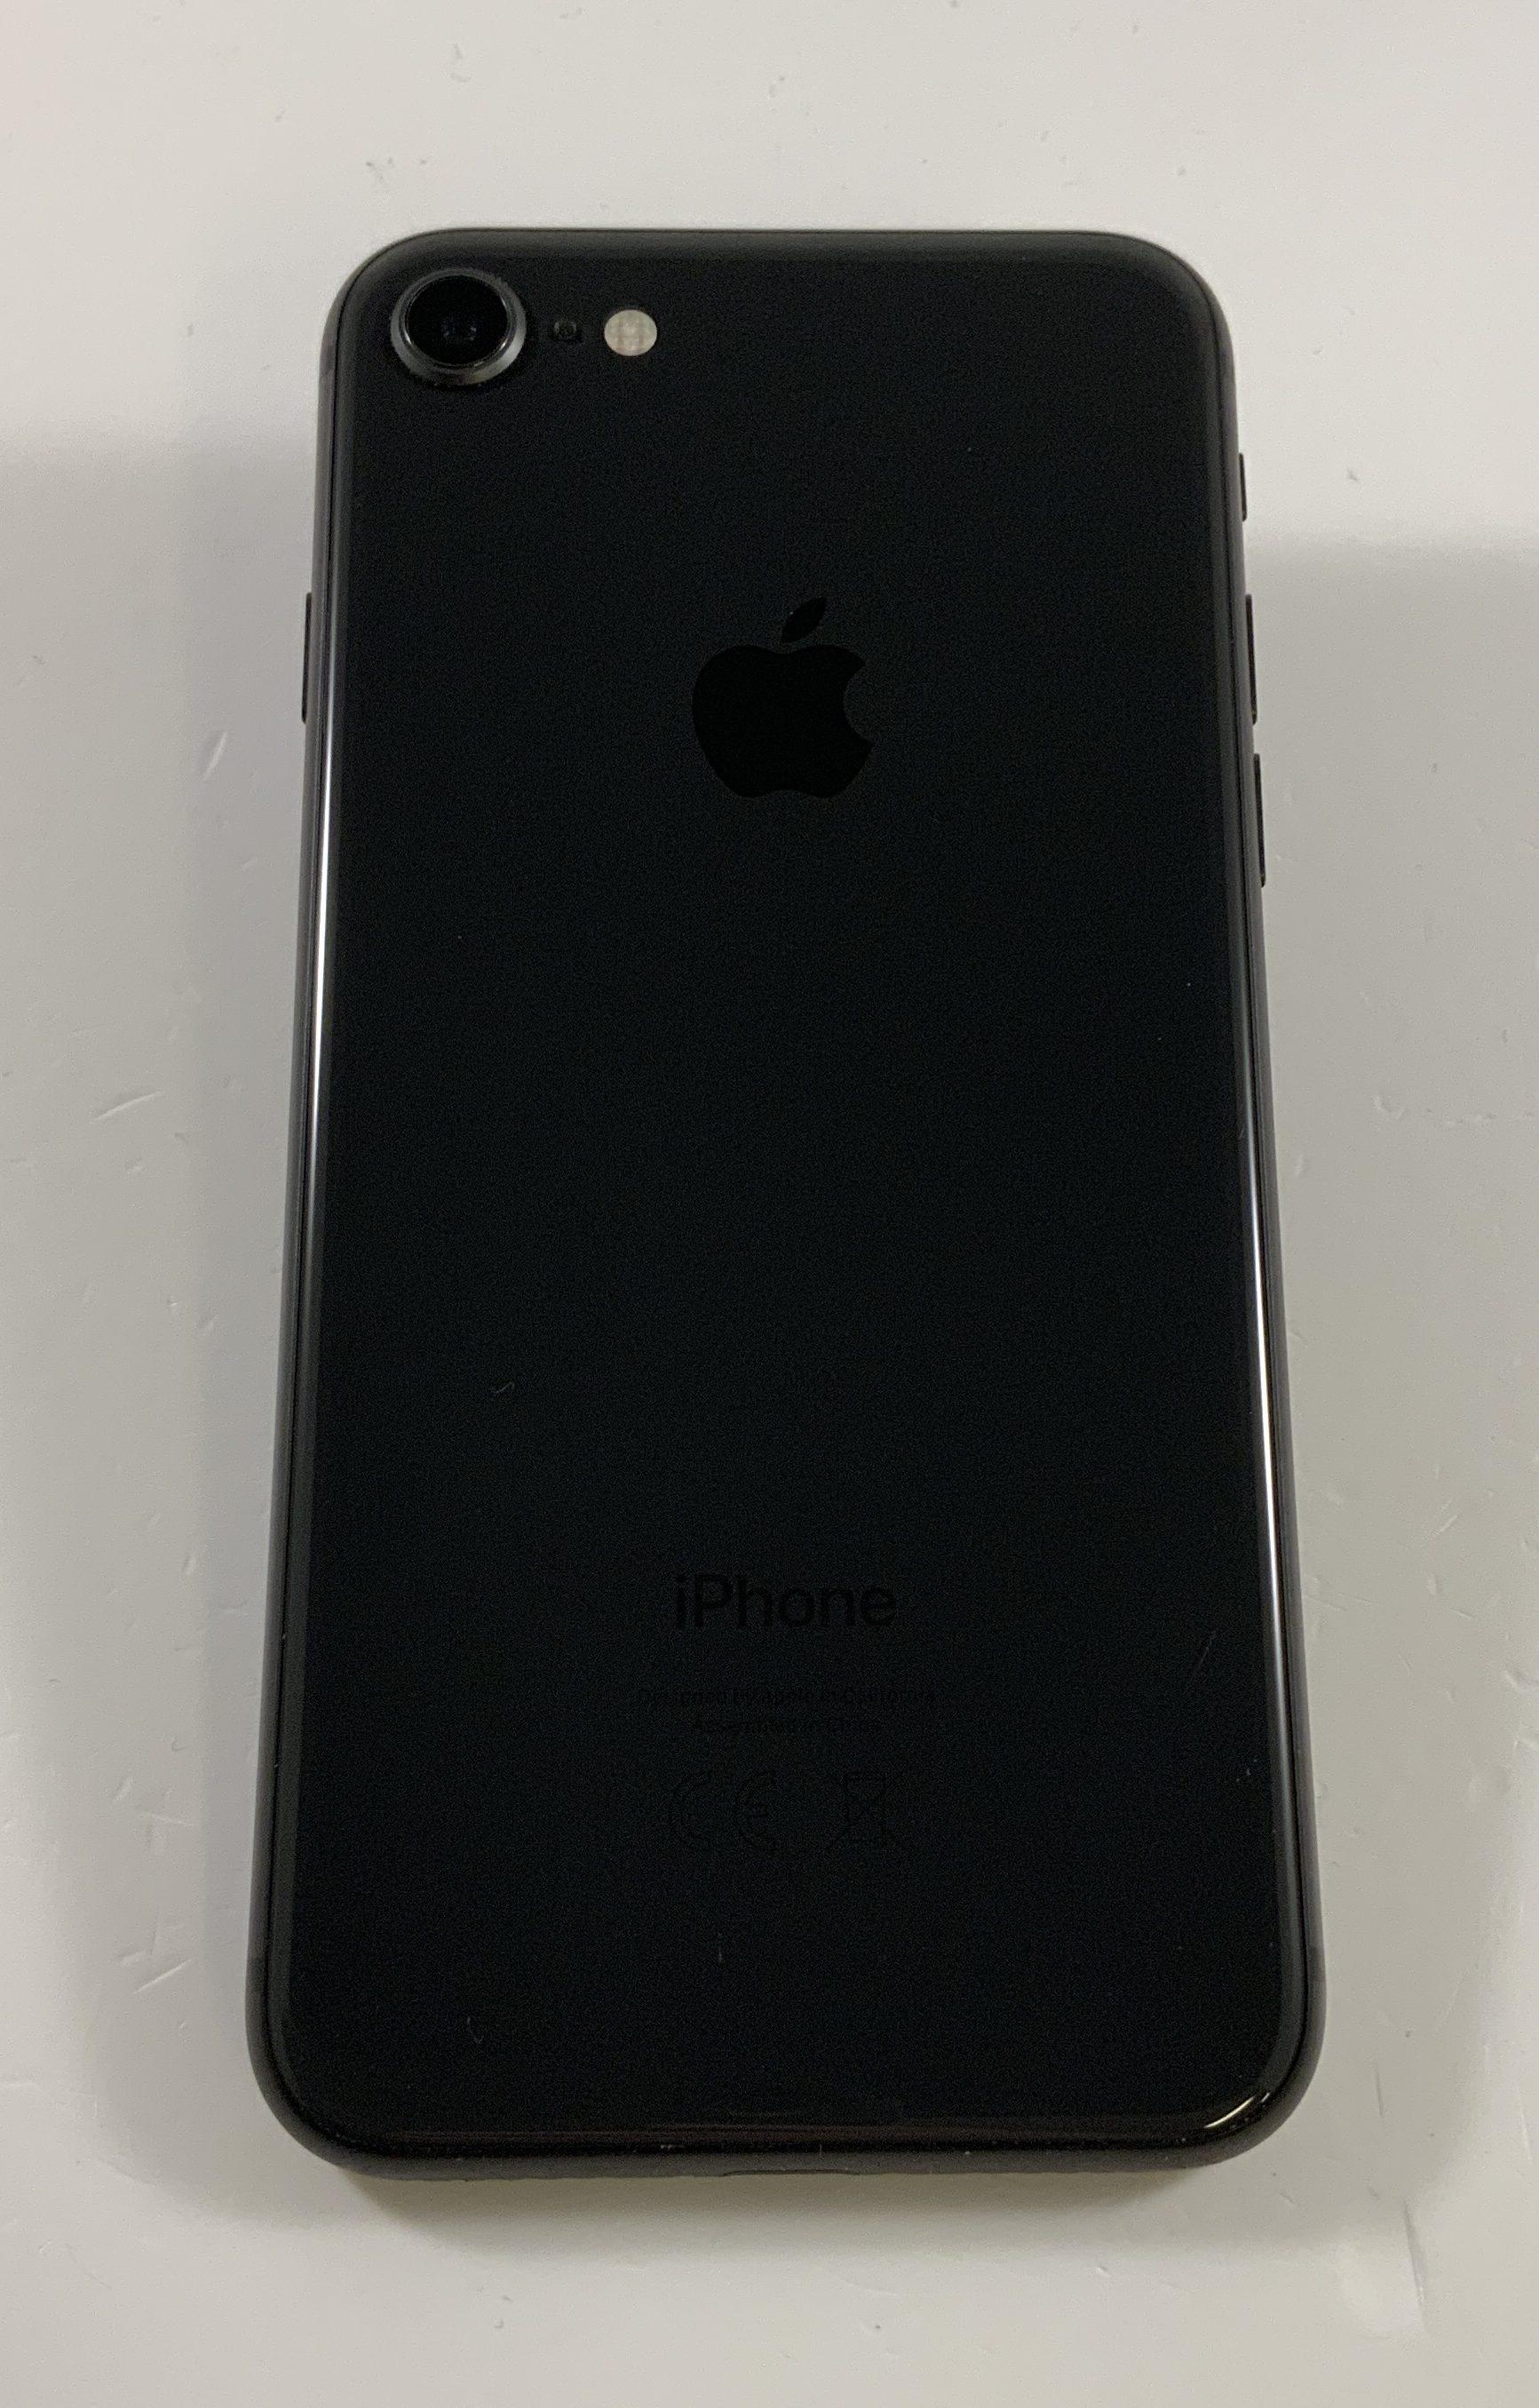 iPhone 8 64GB, 64GB, Space Gray, Bild 2